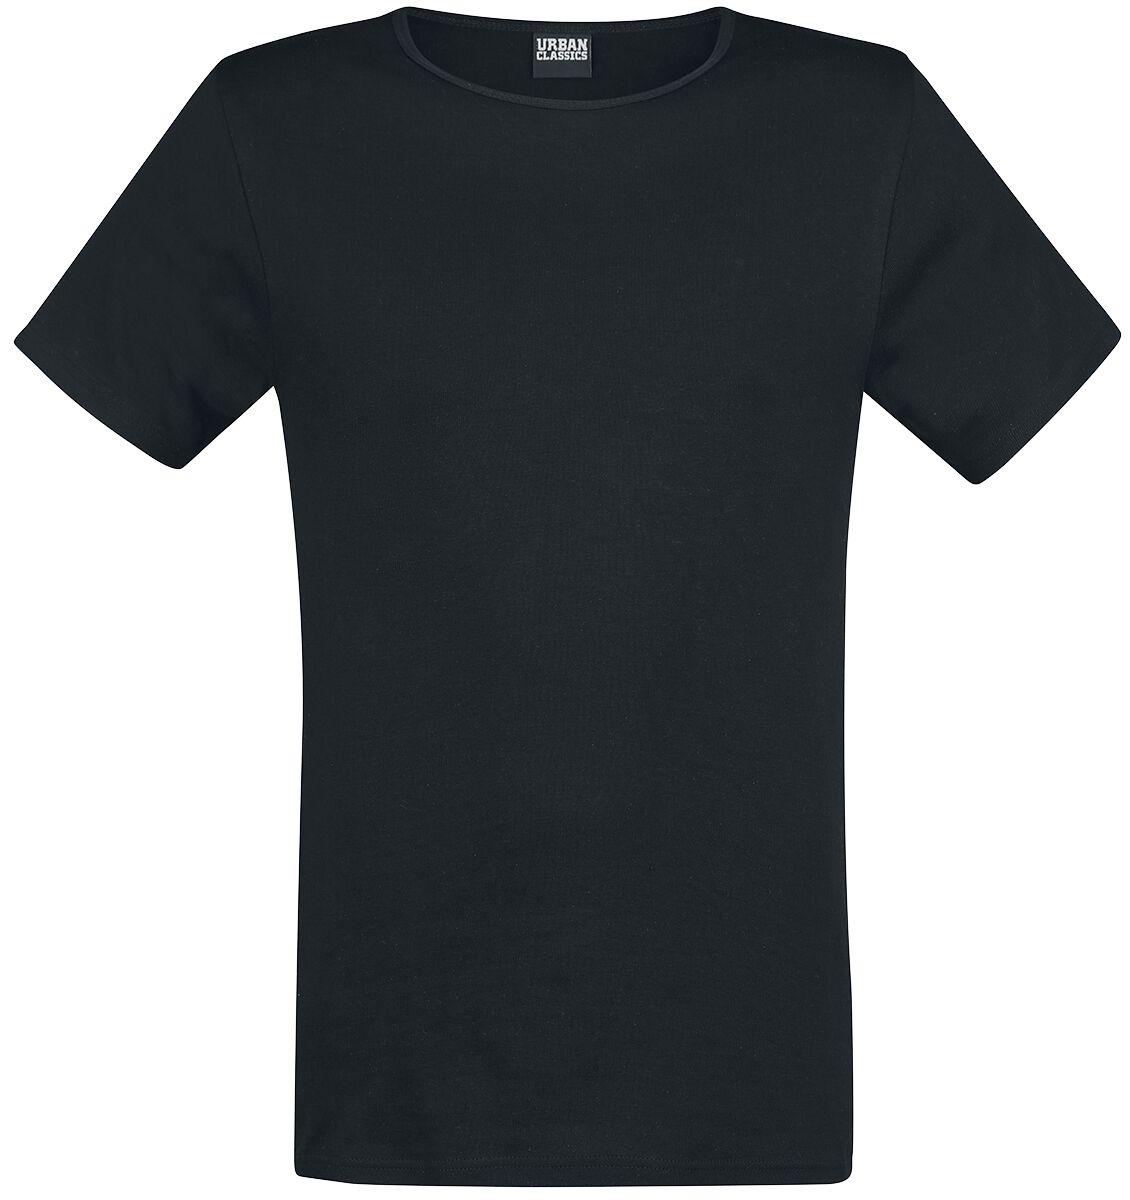 Image of   Urban Classics 2-Pack Seamless Tee T-Shirt sort